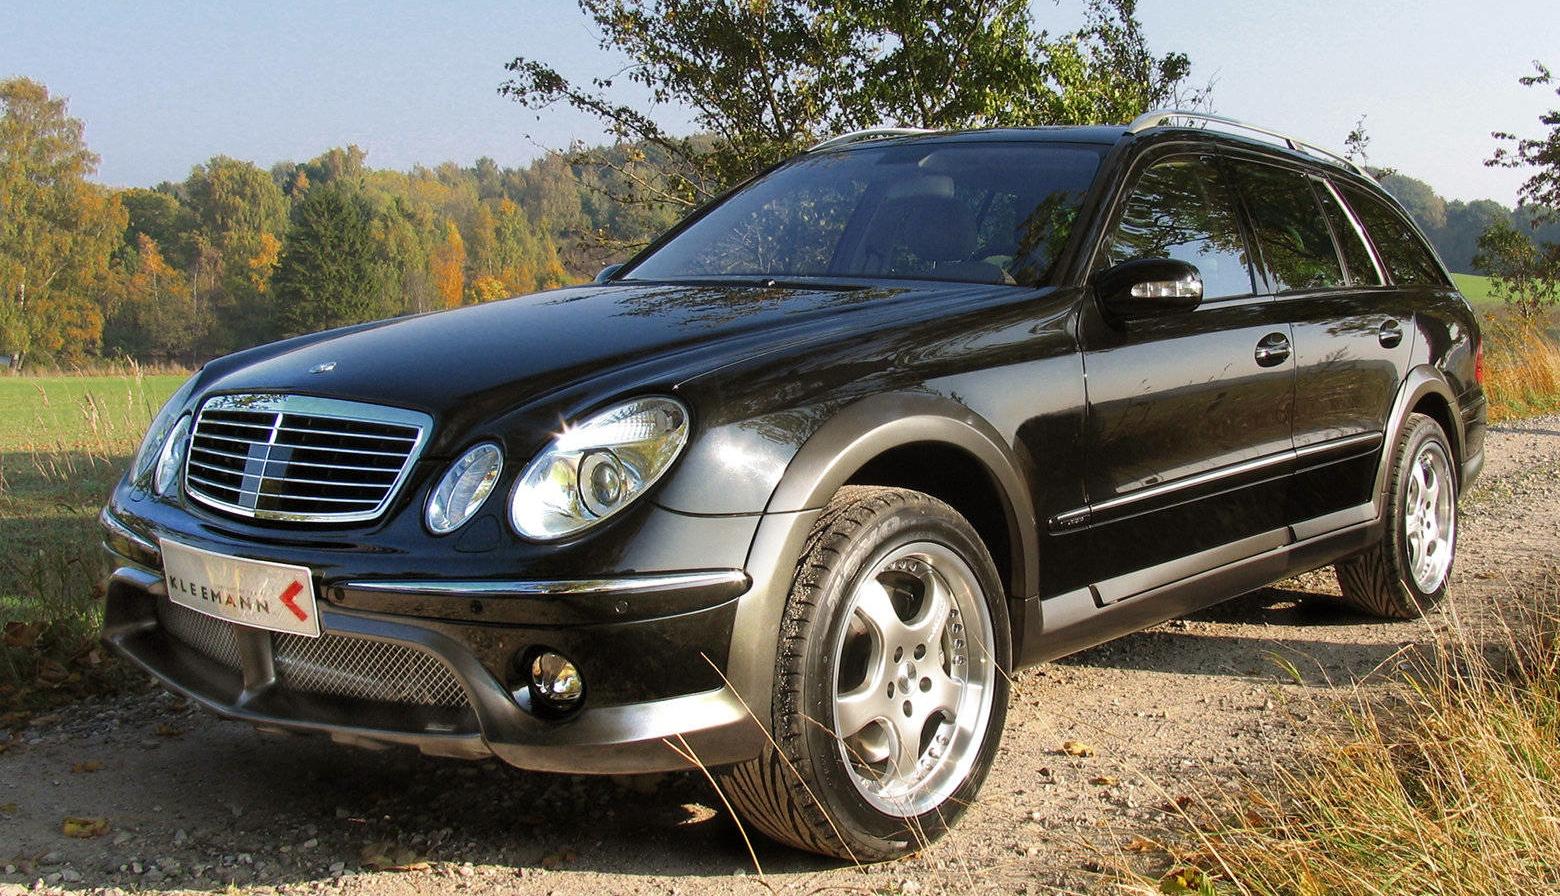 2005 Kleemann E-Class Is the Only Mercedes Allroad Estate - autoevolution